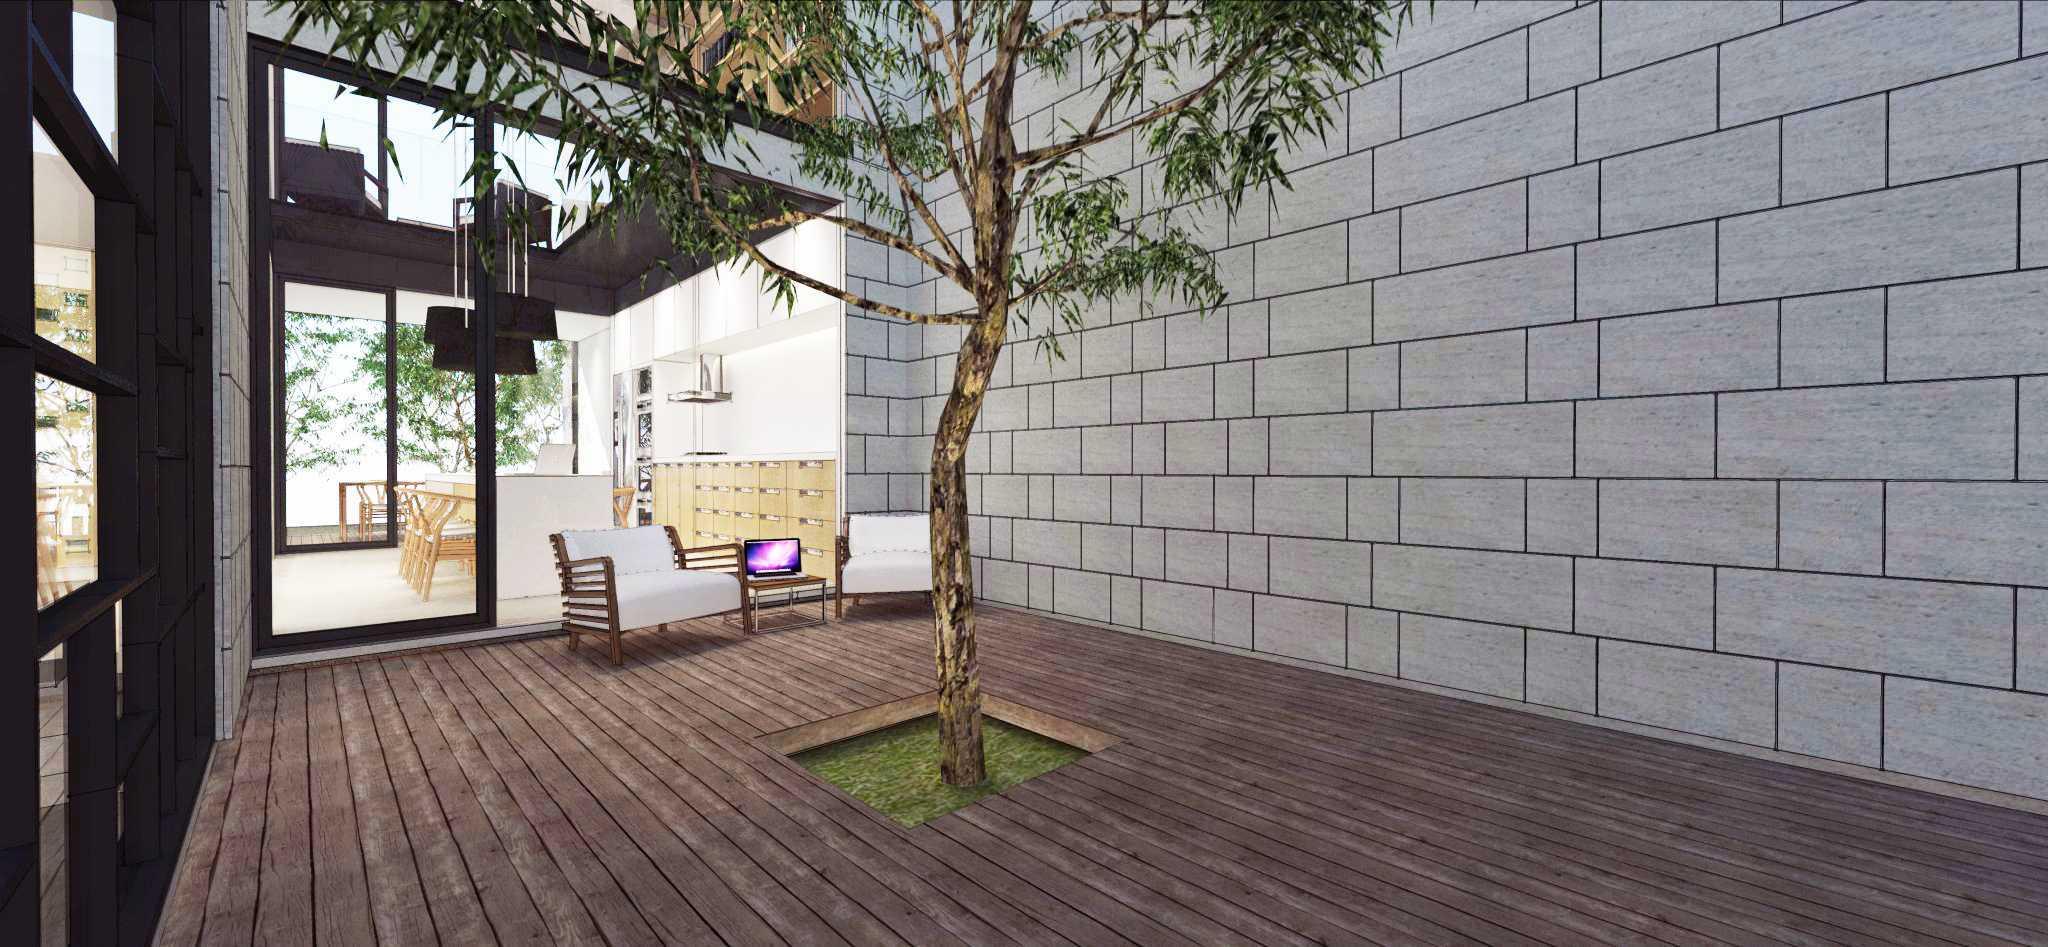 Ari Wibowo Design (Aw.d) Rk House Jakarta, Indonesia - Terrace Modern  14525